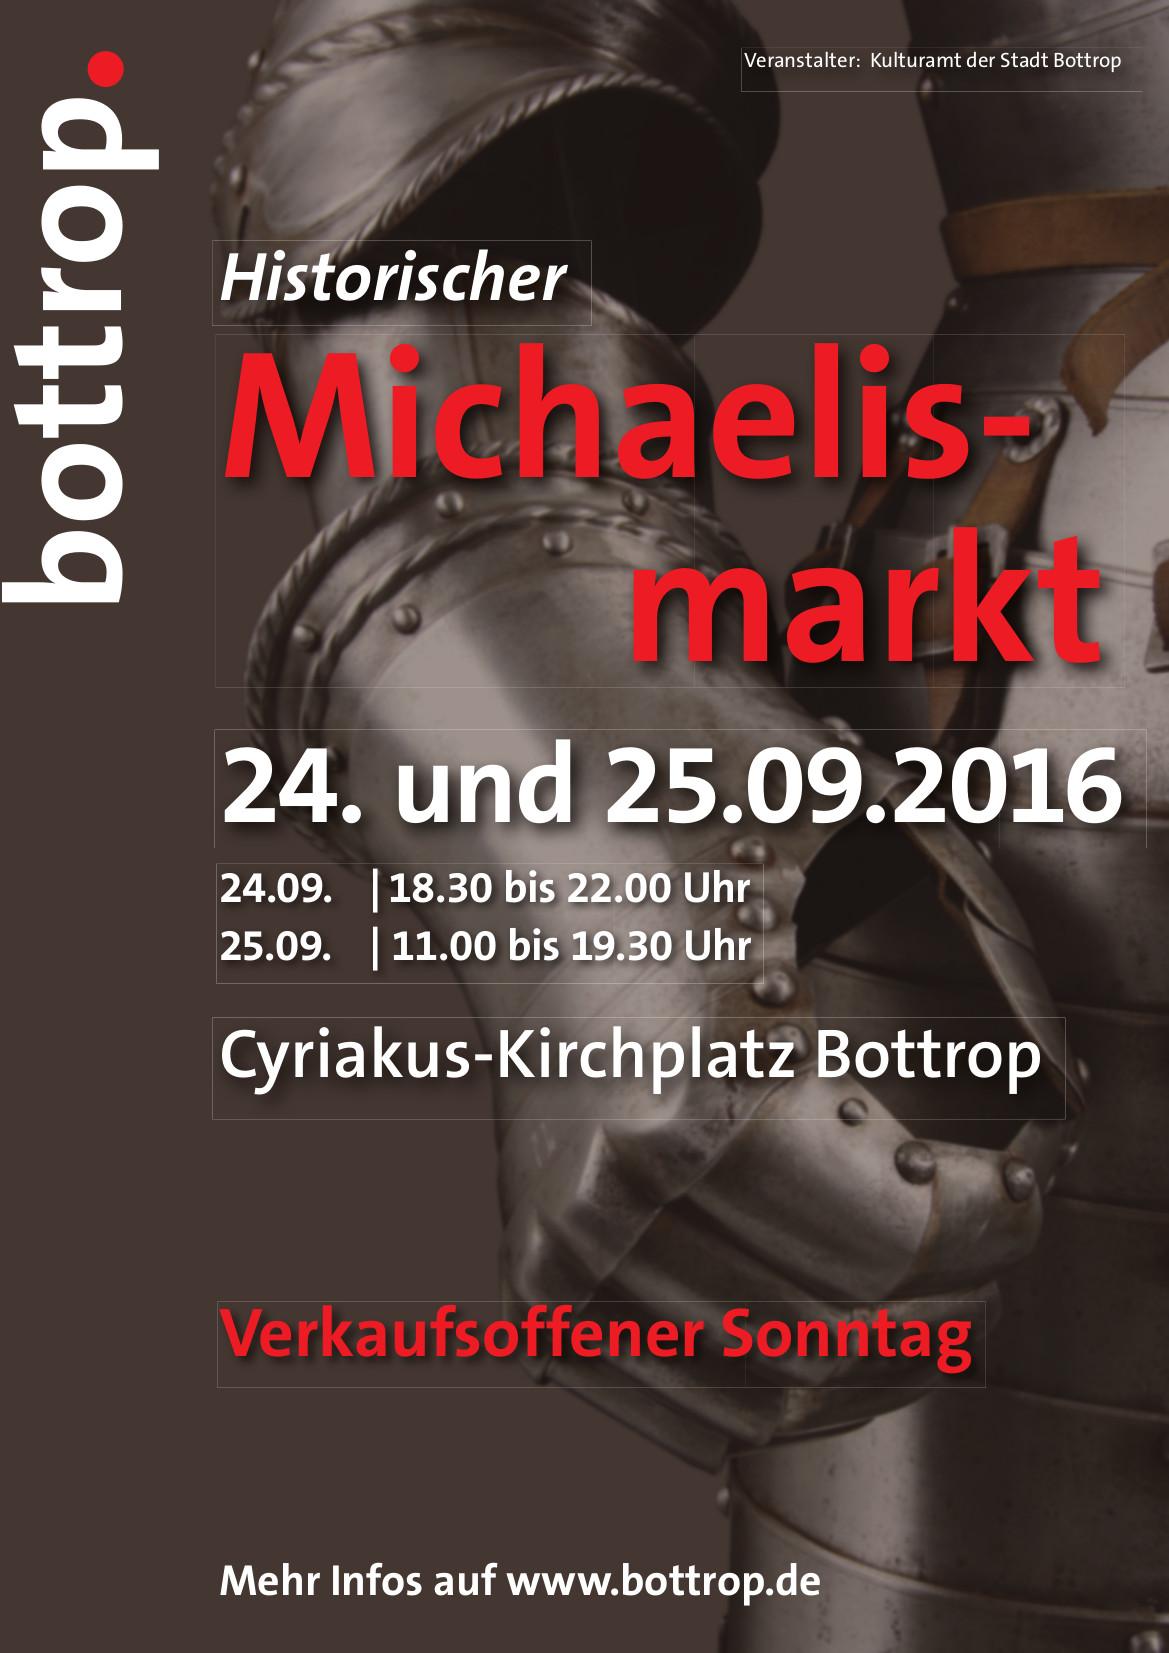 a3_michaelis-markt_2016